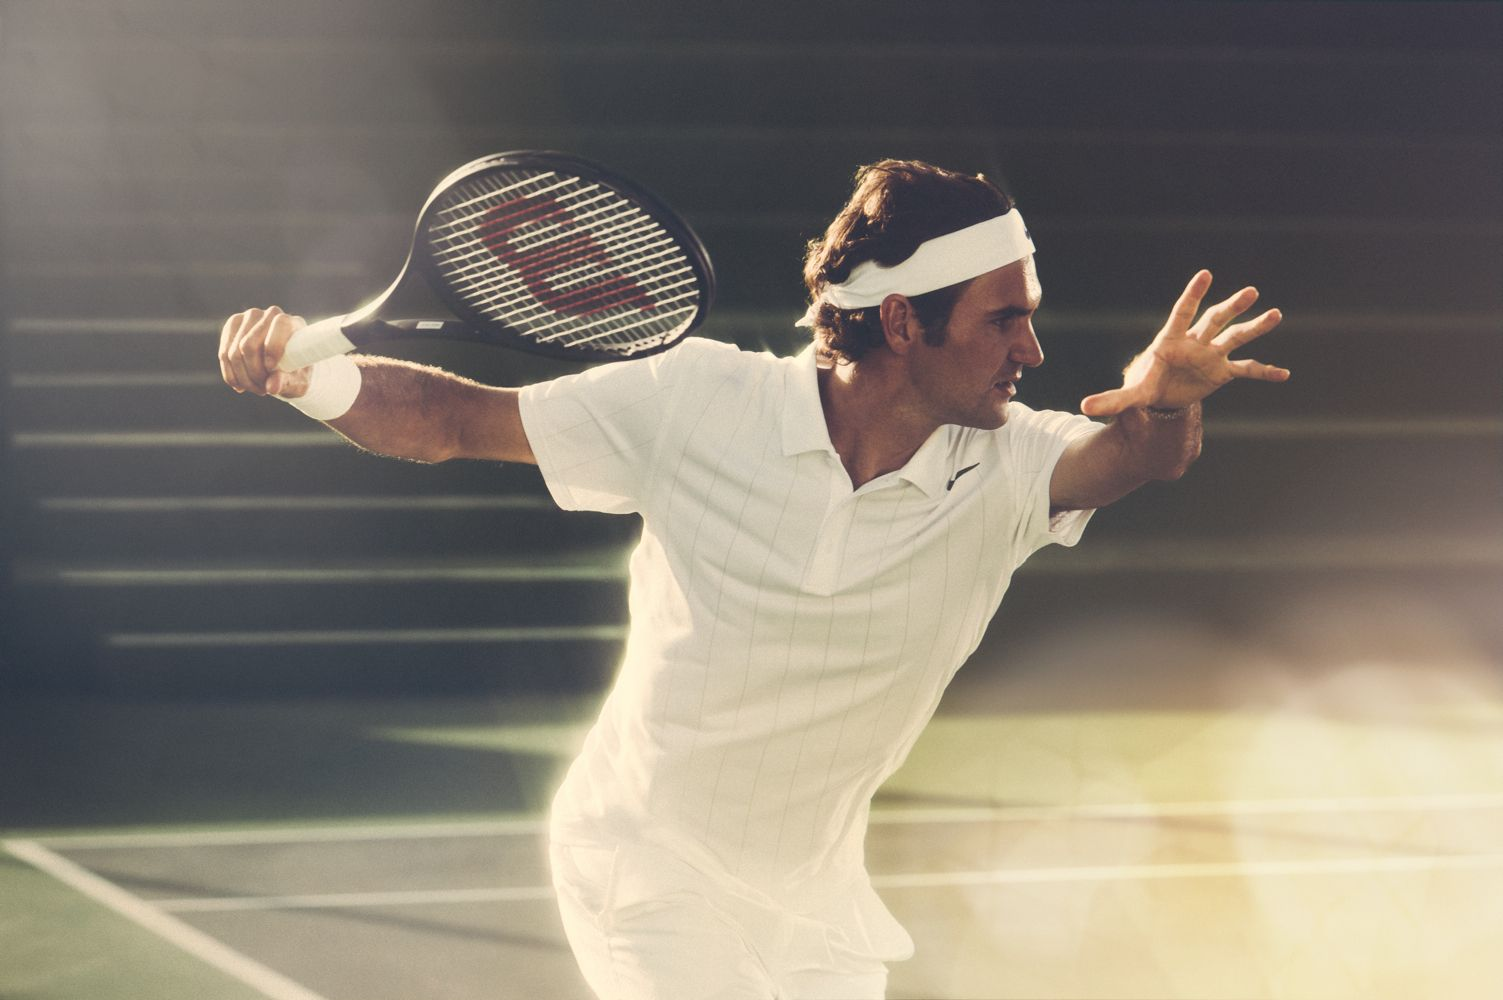 Carlos Serrao Roger federer, Tennis, Tennis photos